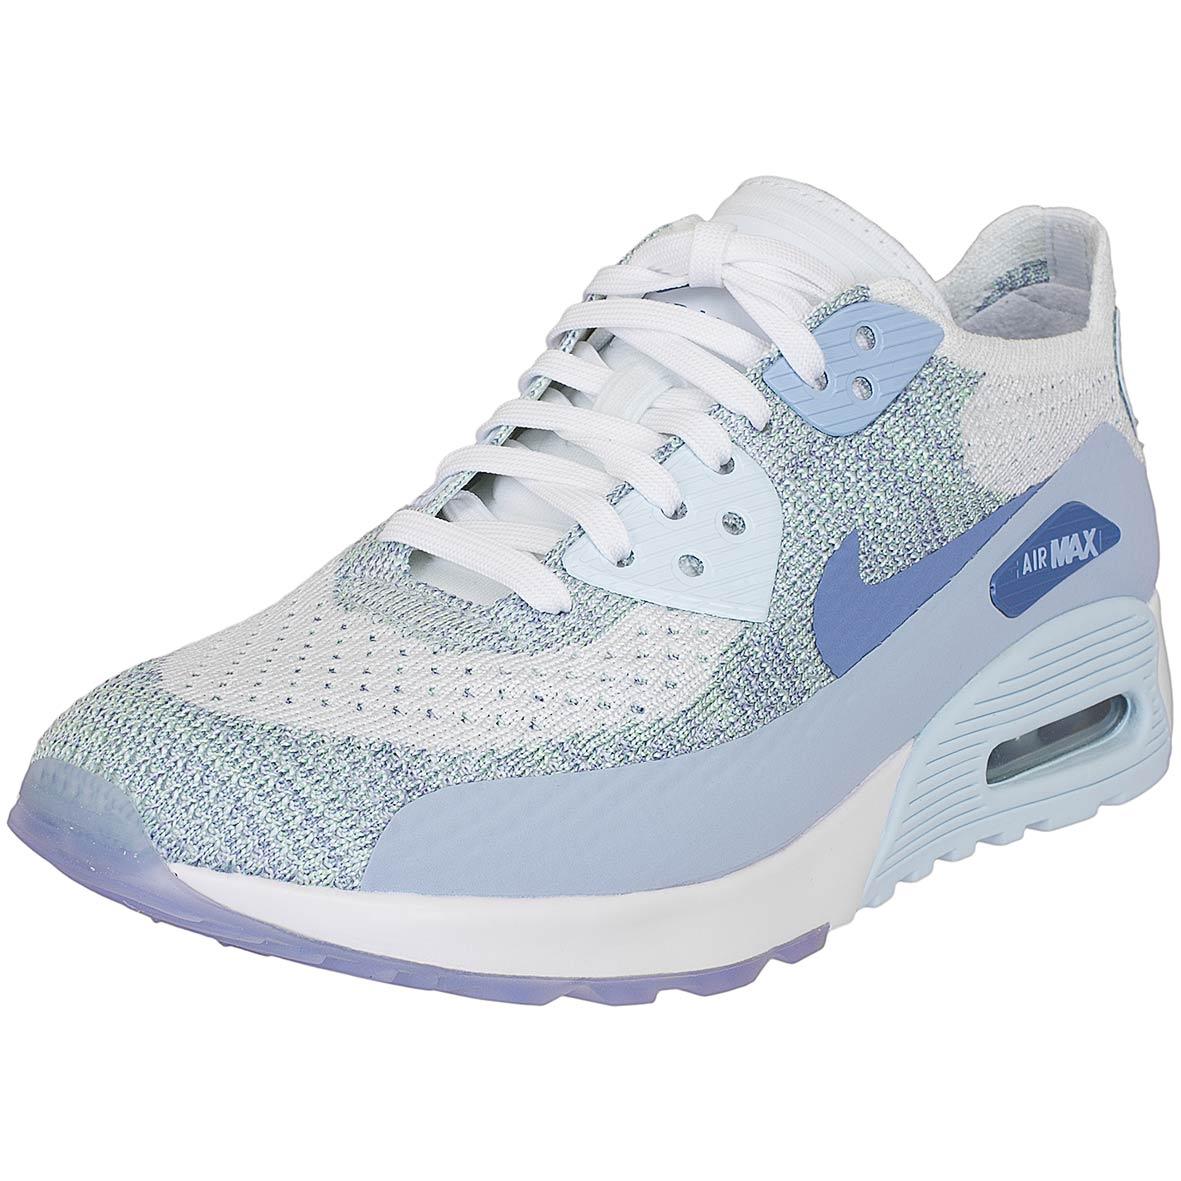 acf73001883a7c ☆ Nike Damen Sneaker Air Max 90 Ultra 2.0 Flyknit weiß blau - hier ...